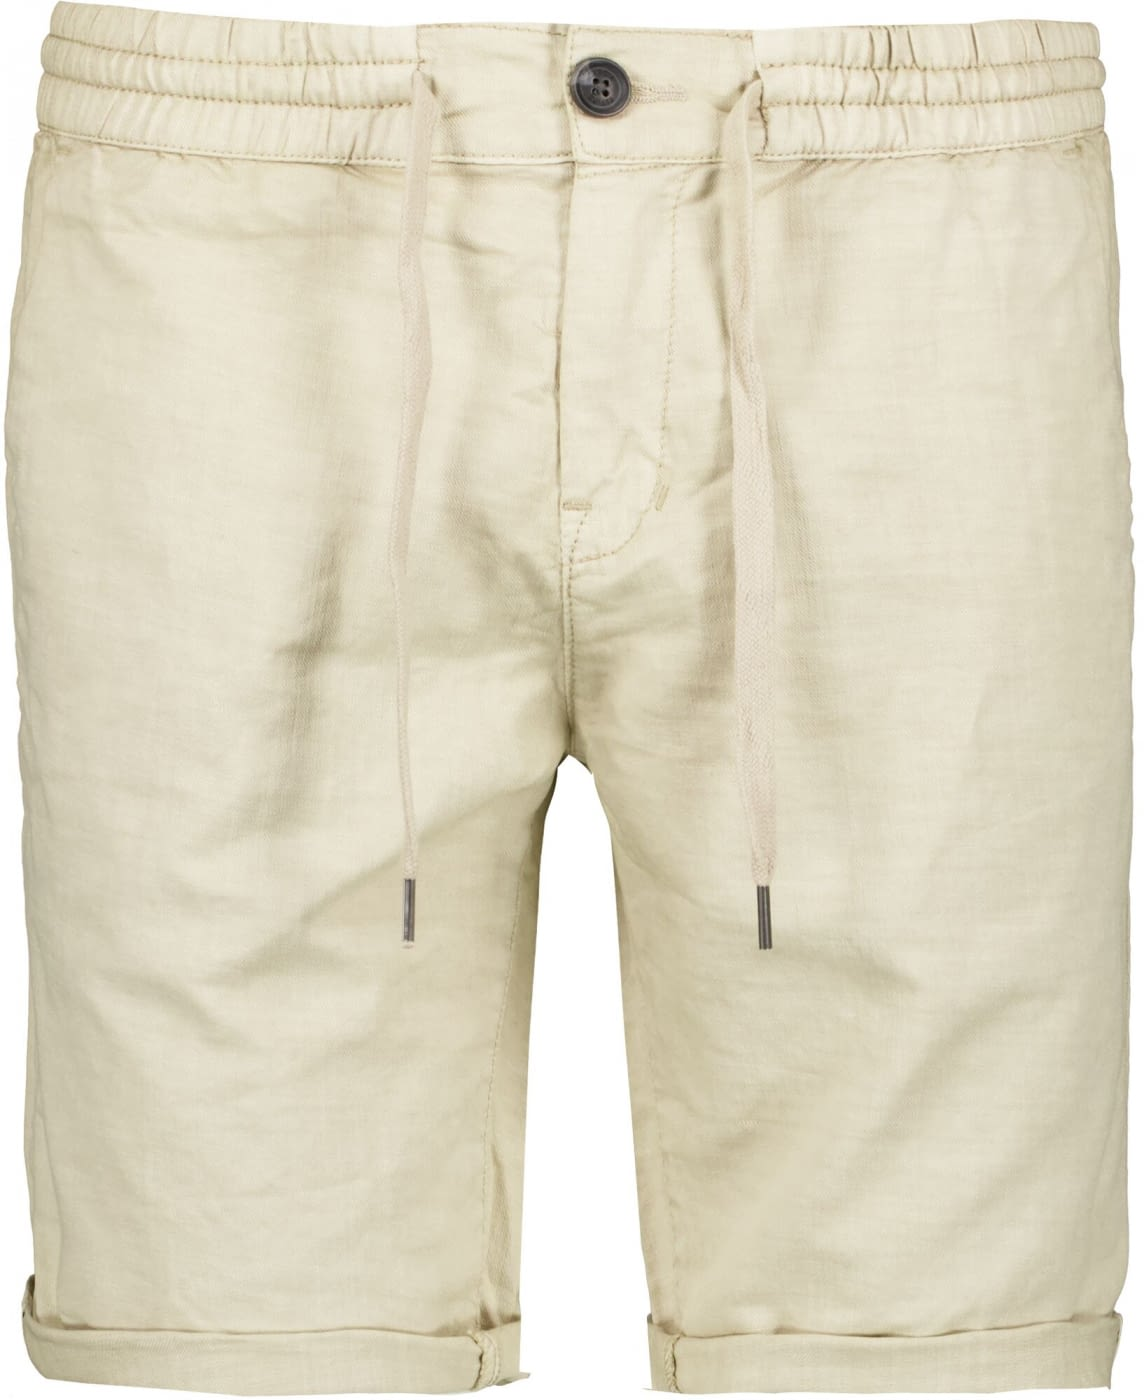 GARCIA pantalón corto Santo